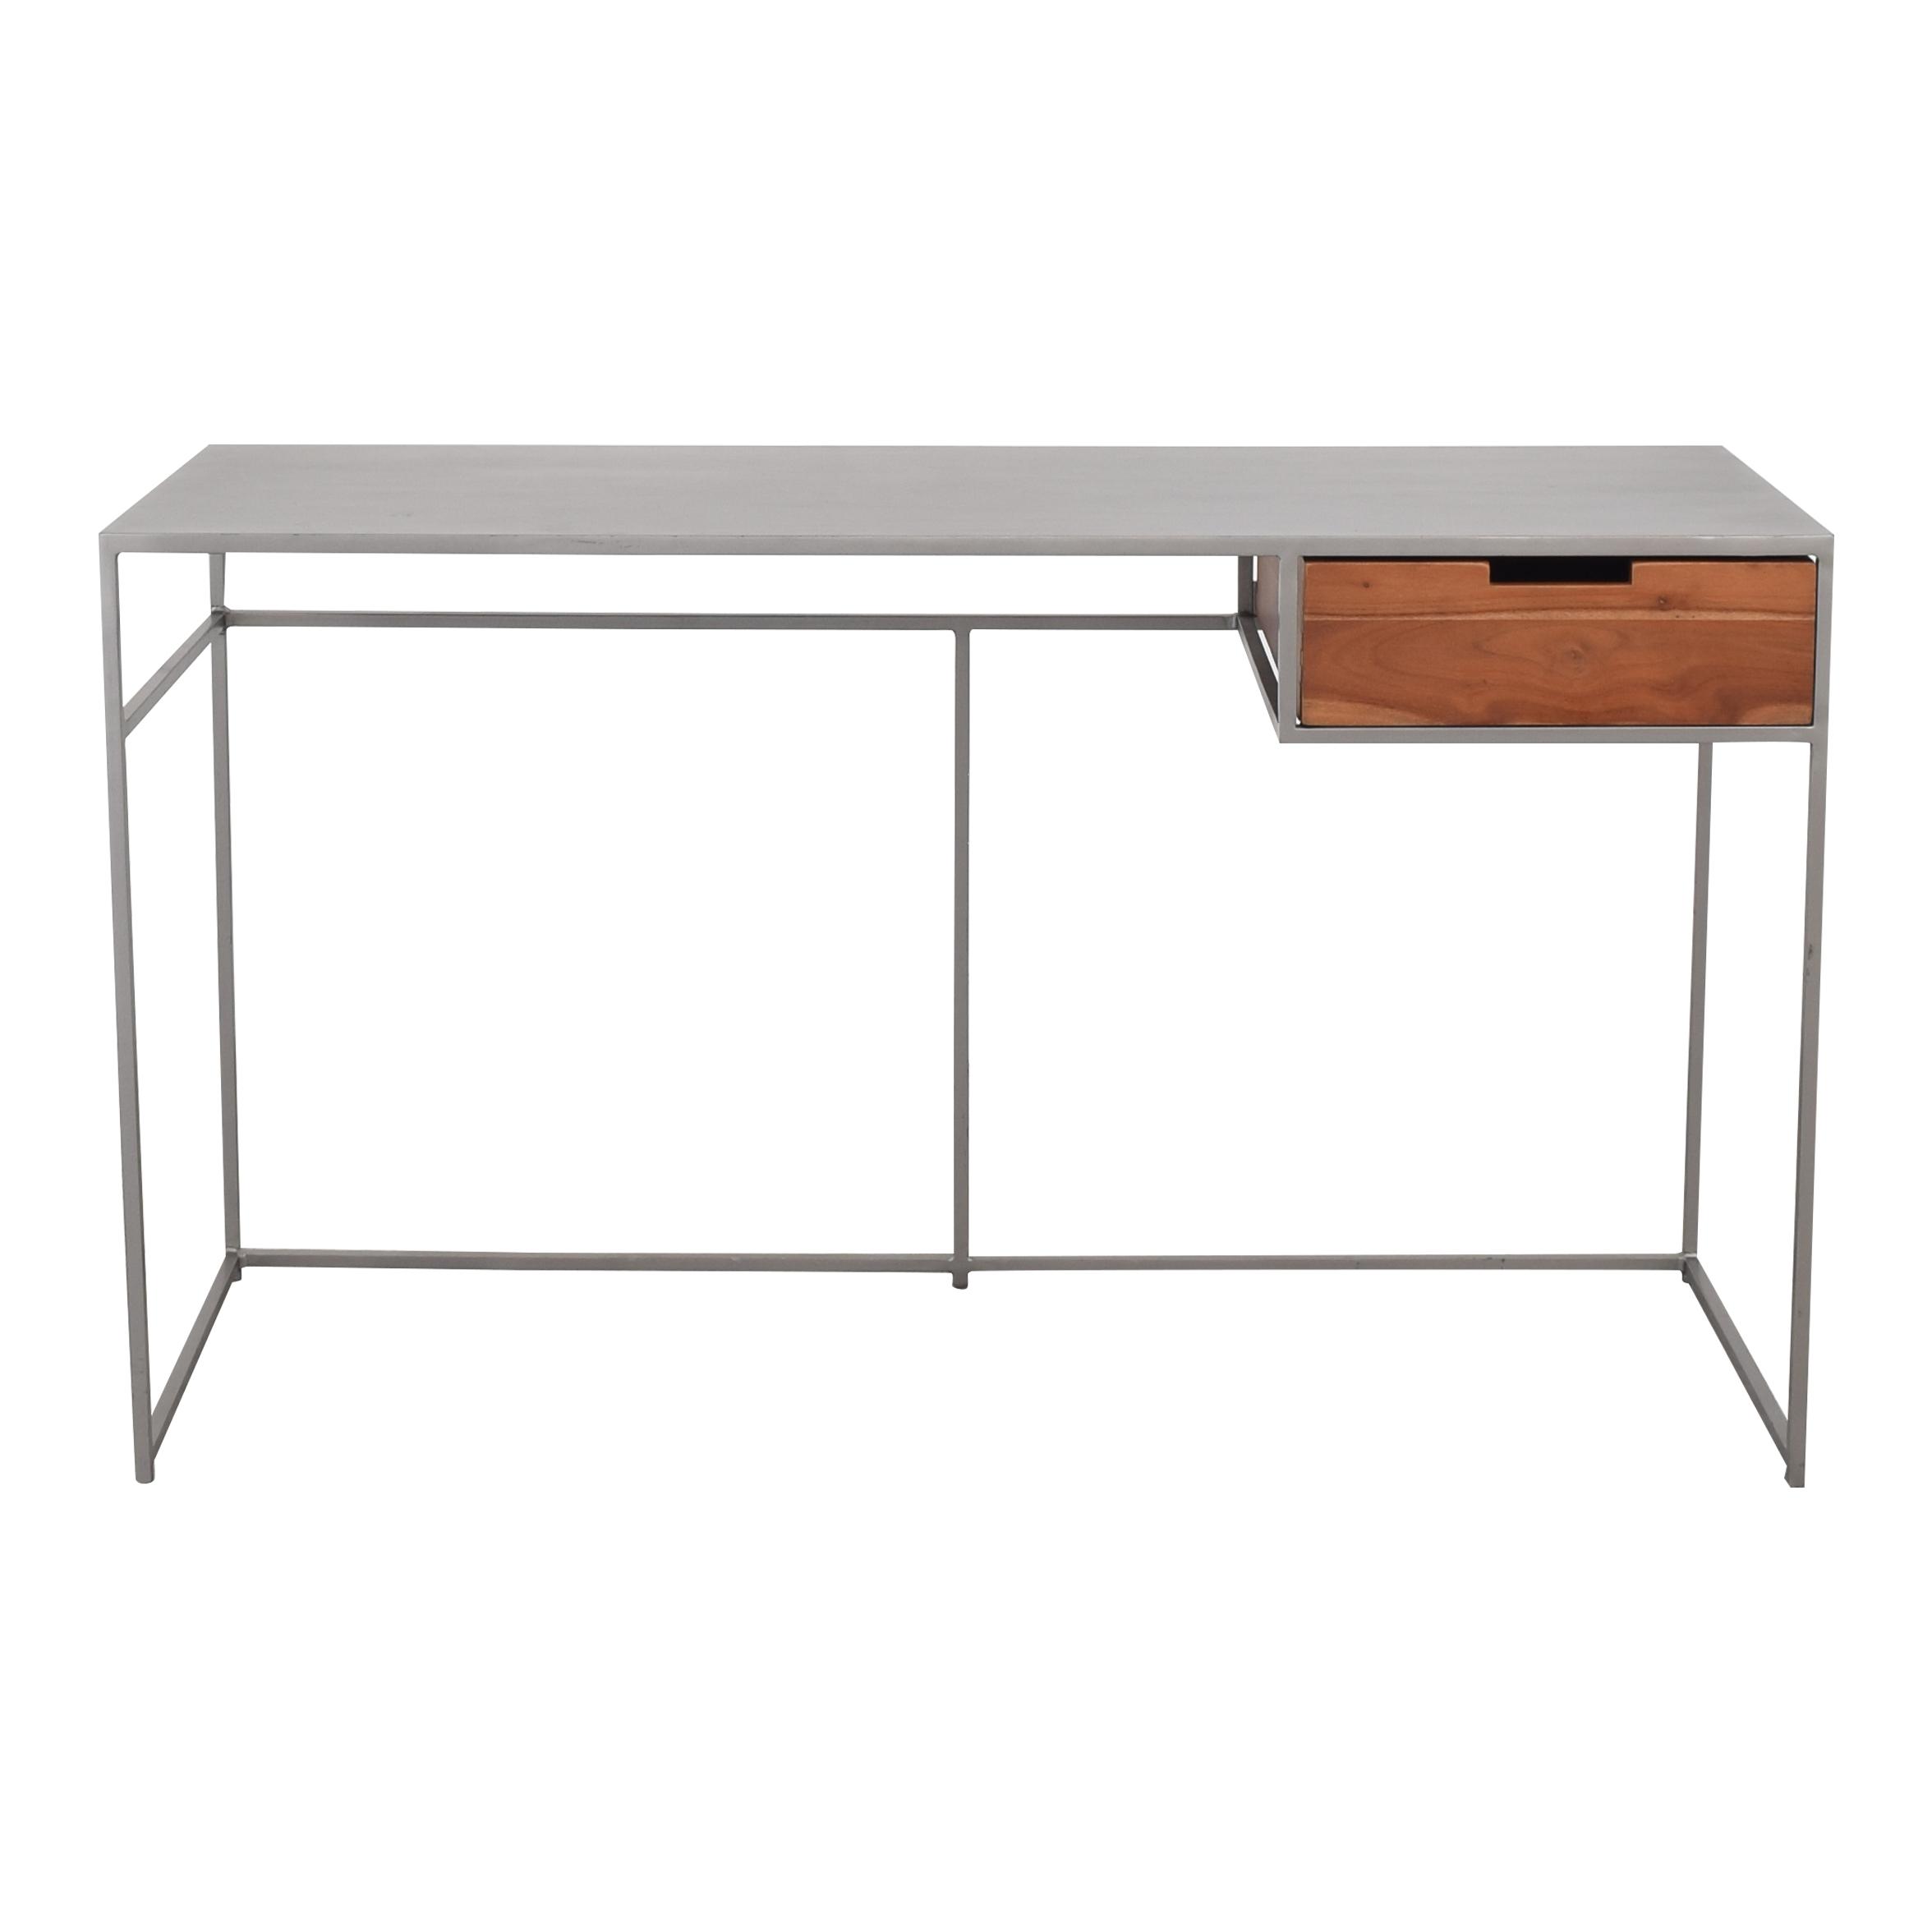 CB2 CB2 Guapo Metal Single Drawer Desk ma